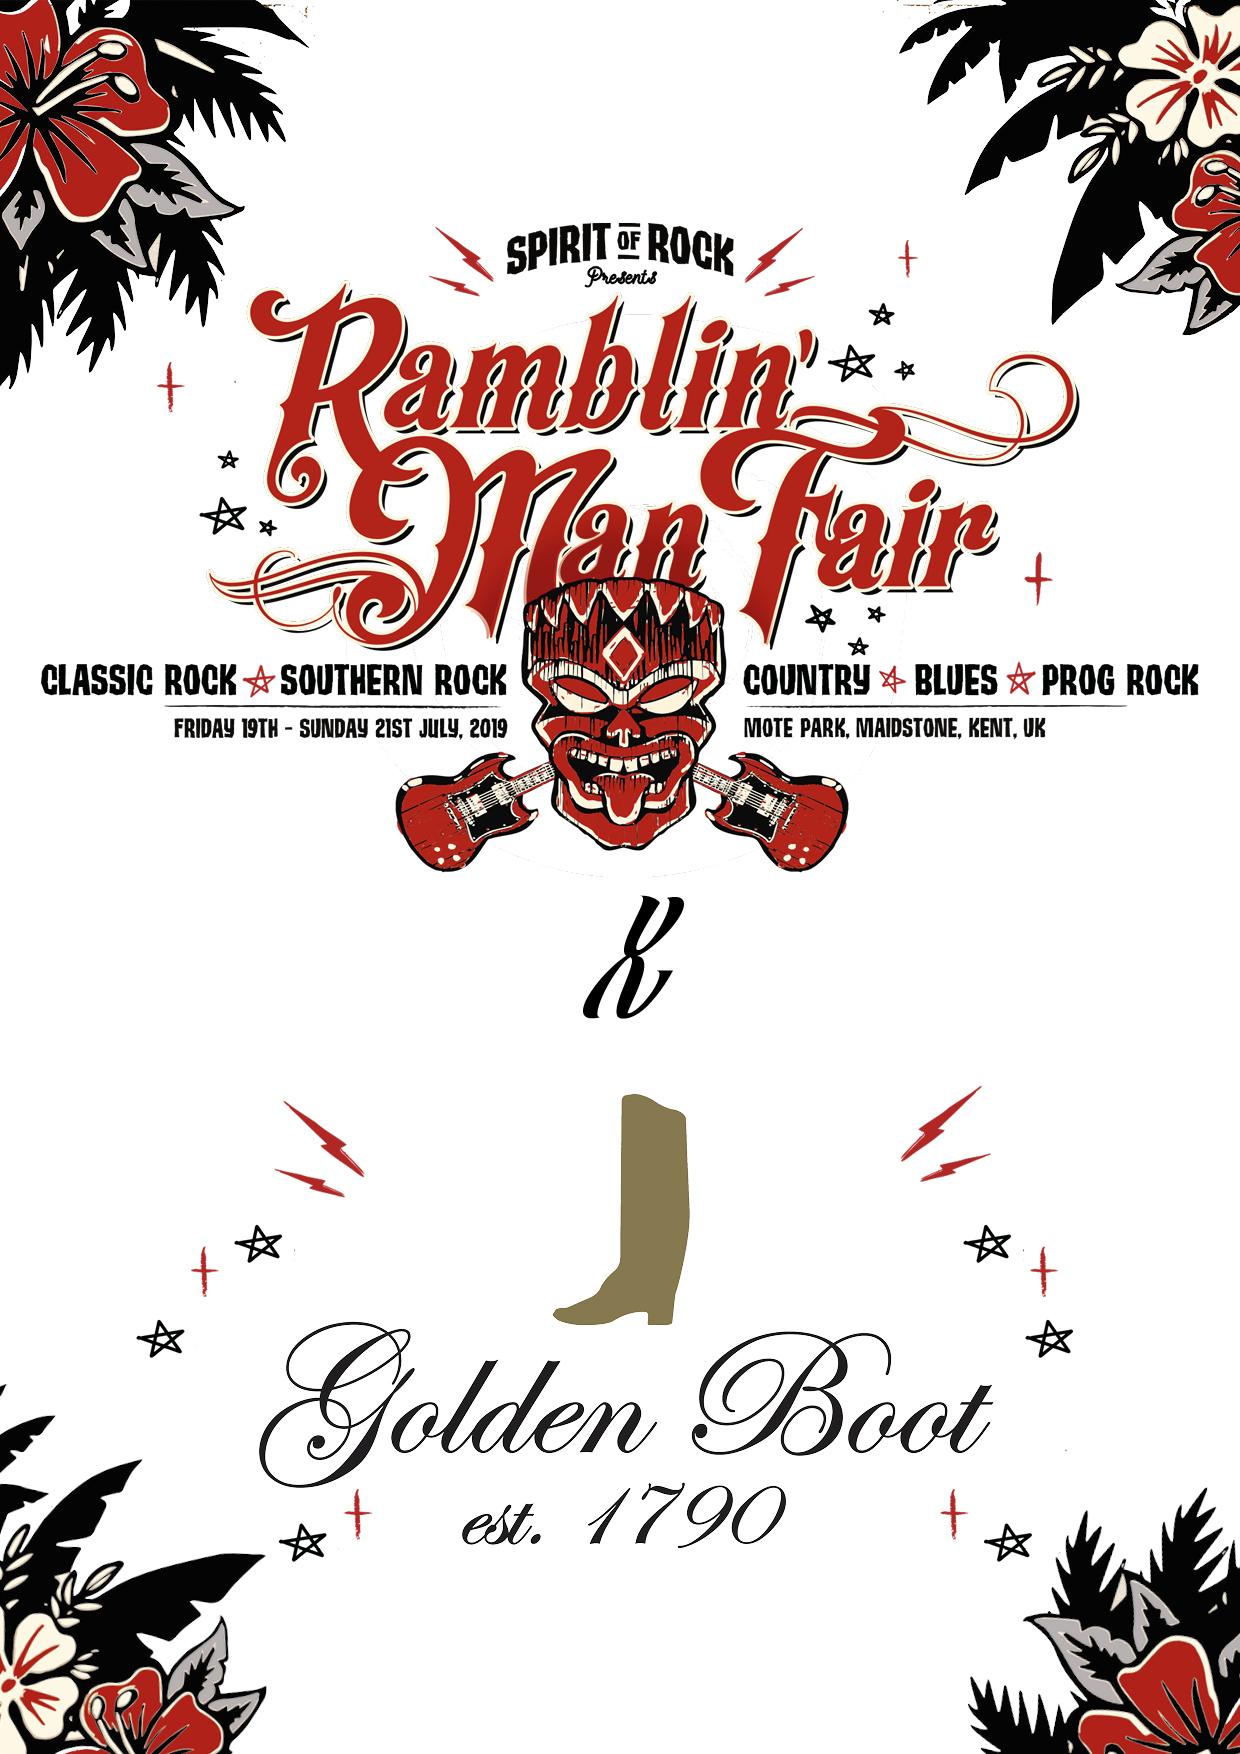 Ramblin' Man 2019 – be festival ready